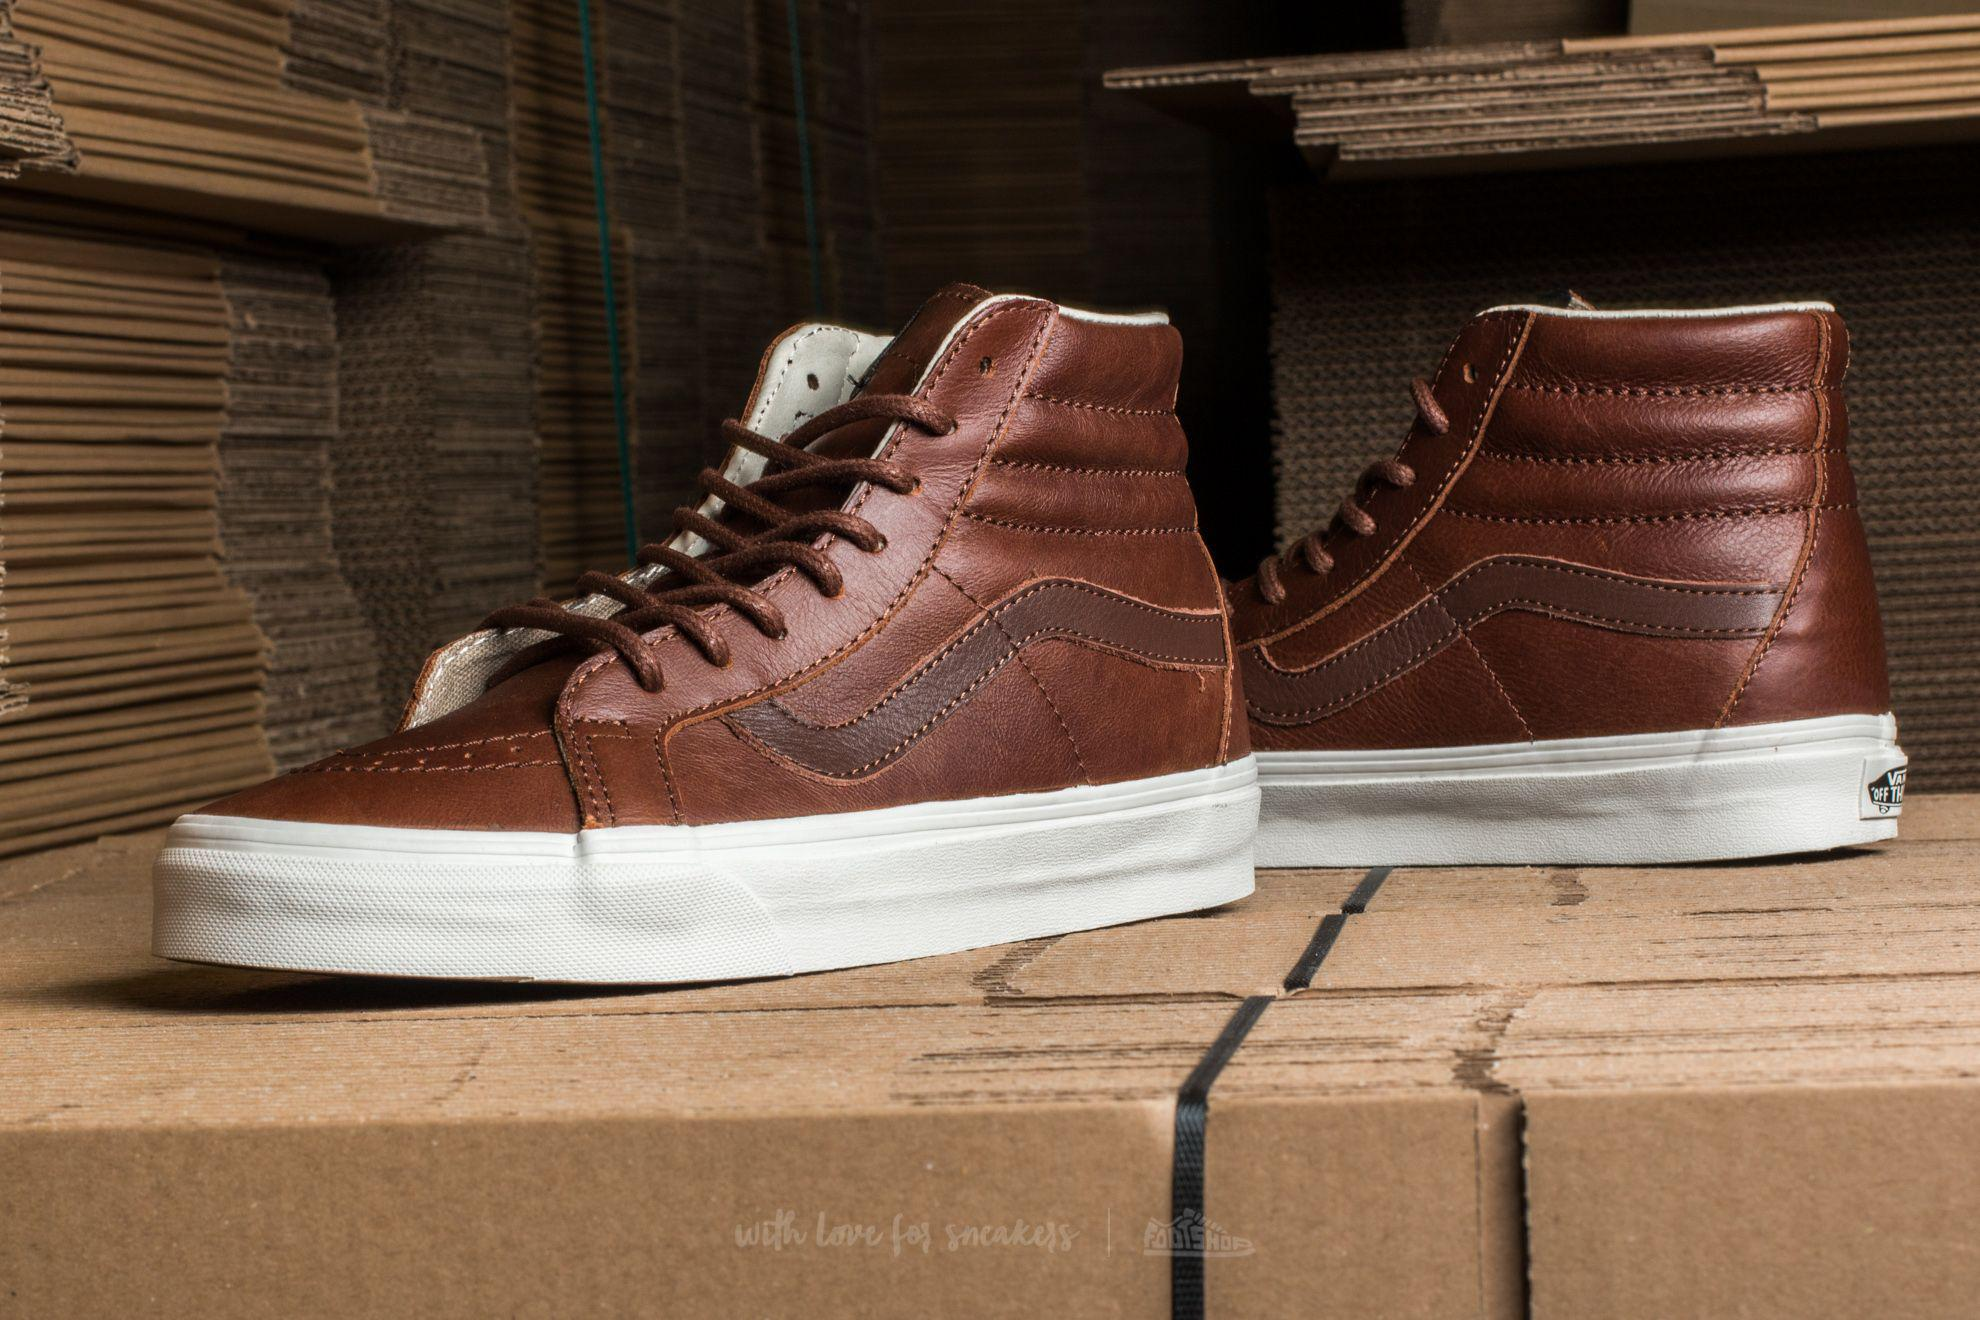 Lyst - Vans Sk8-hi Reissue Leather Dachshund  Potting Soil in Brown ... bdf6c45075ca